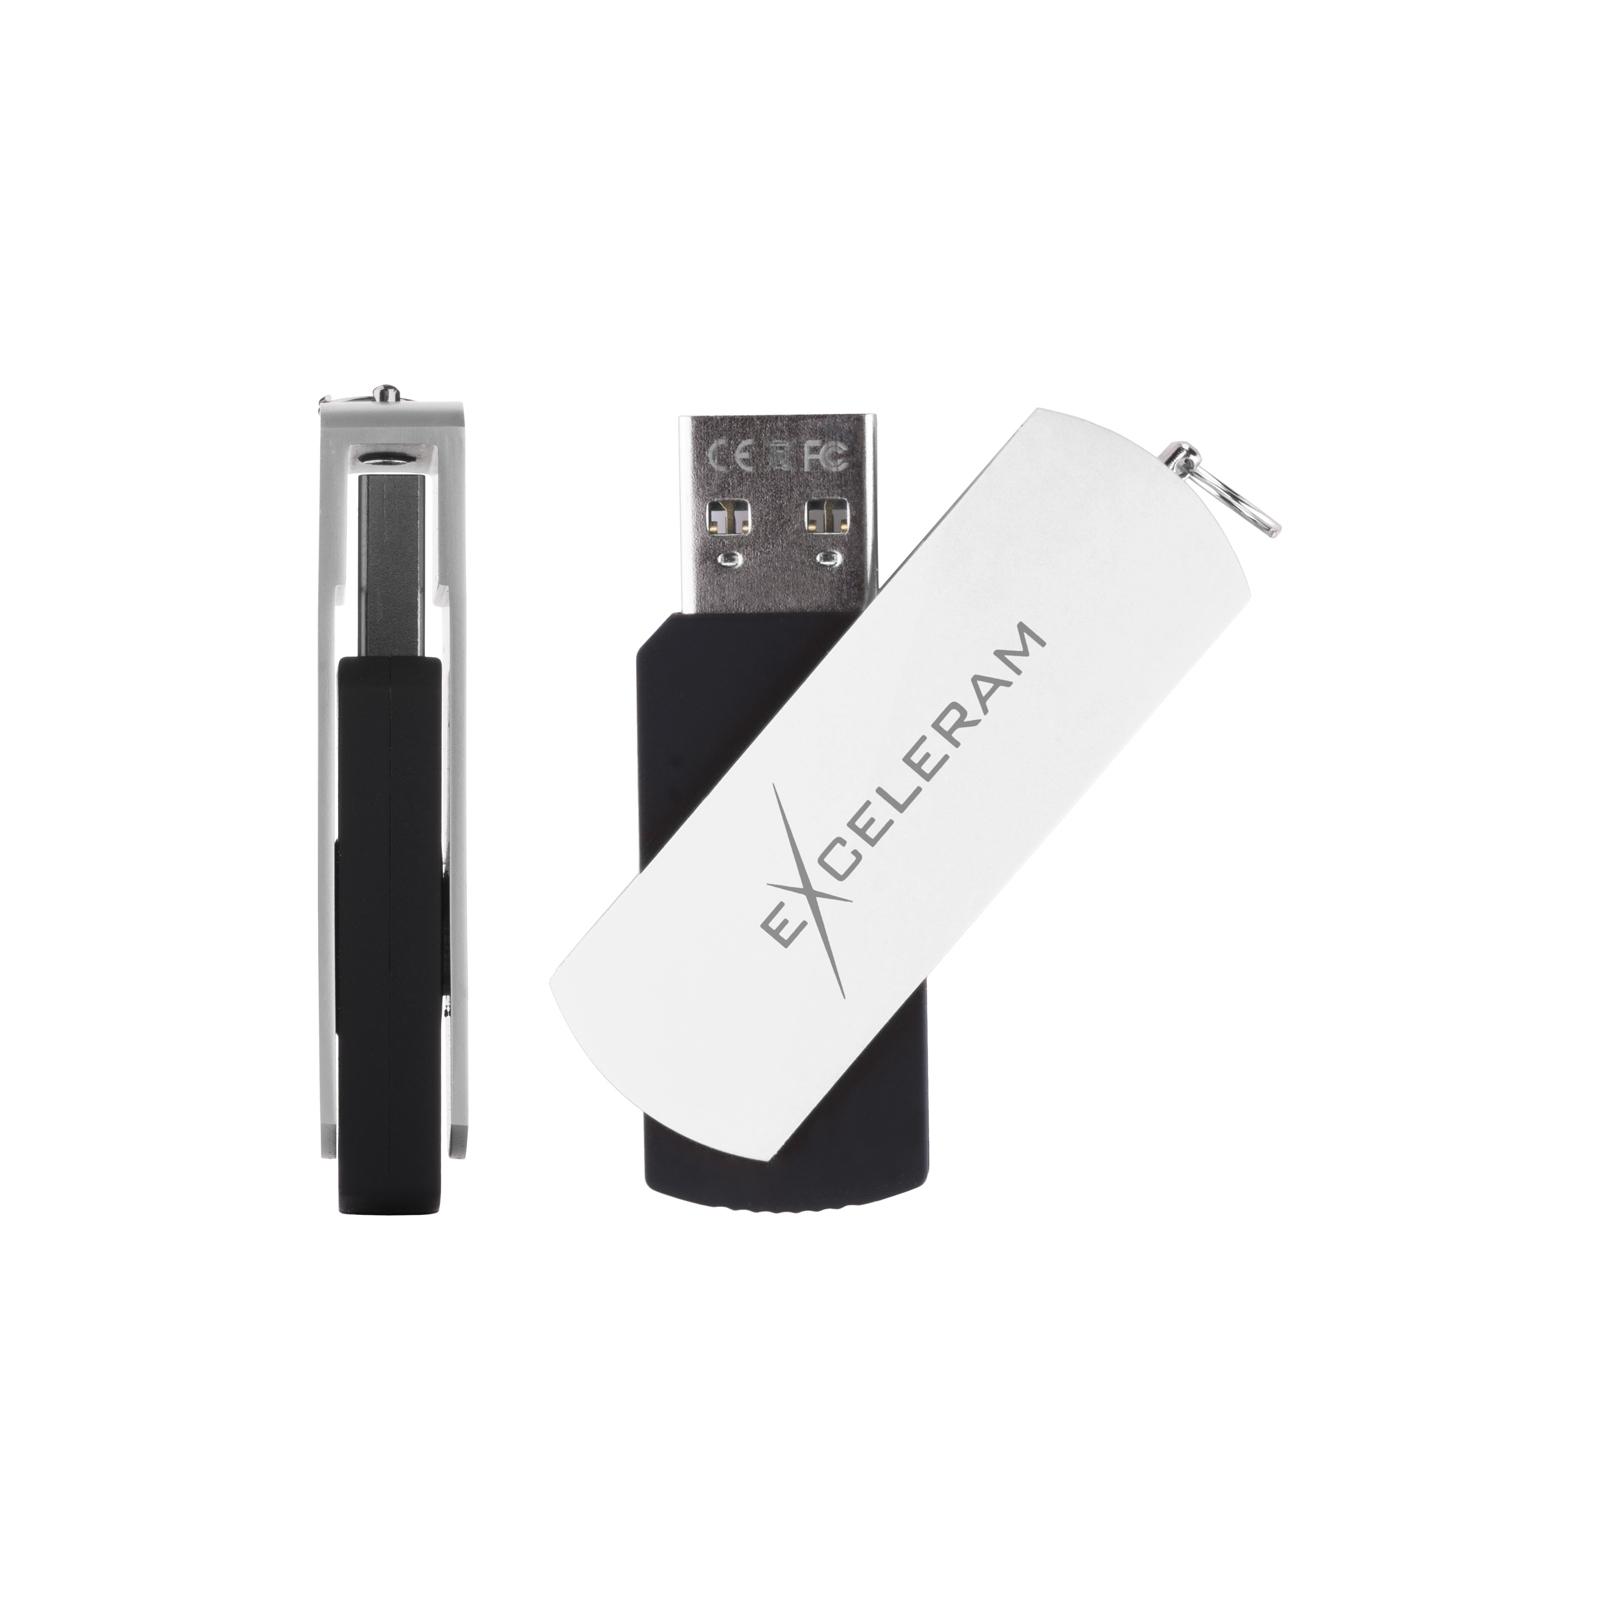 USB флеш накопитель eXceleram 32GB P2 Series White/Black USB 3.1 Gen 1 (EXP2U3WHB32) изображение 4